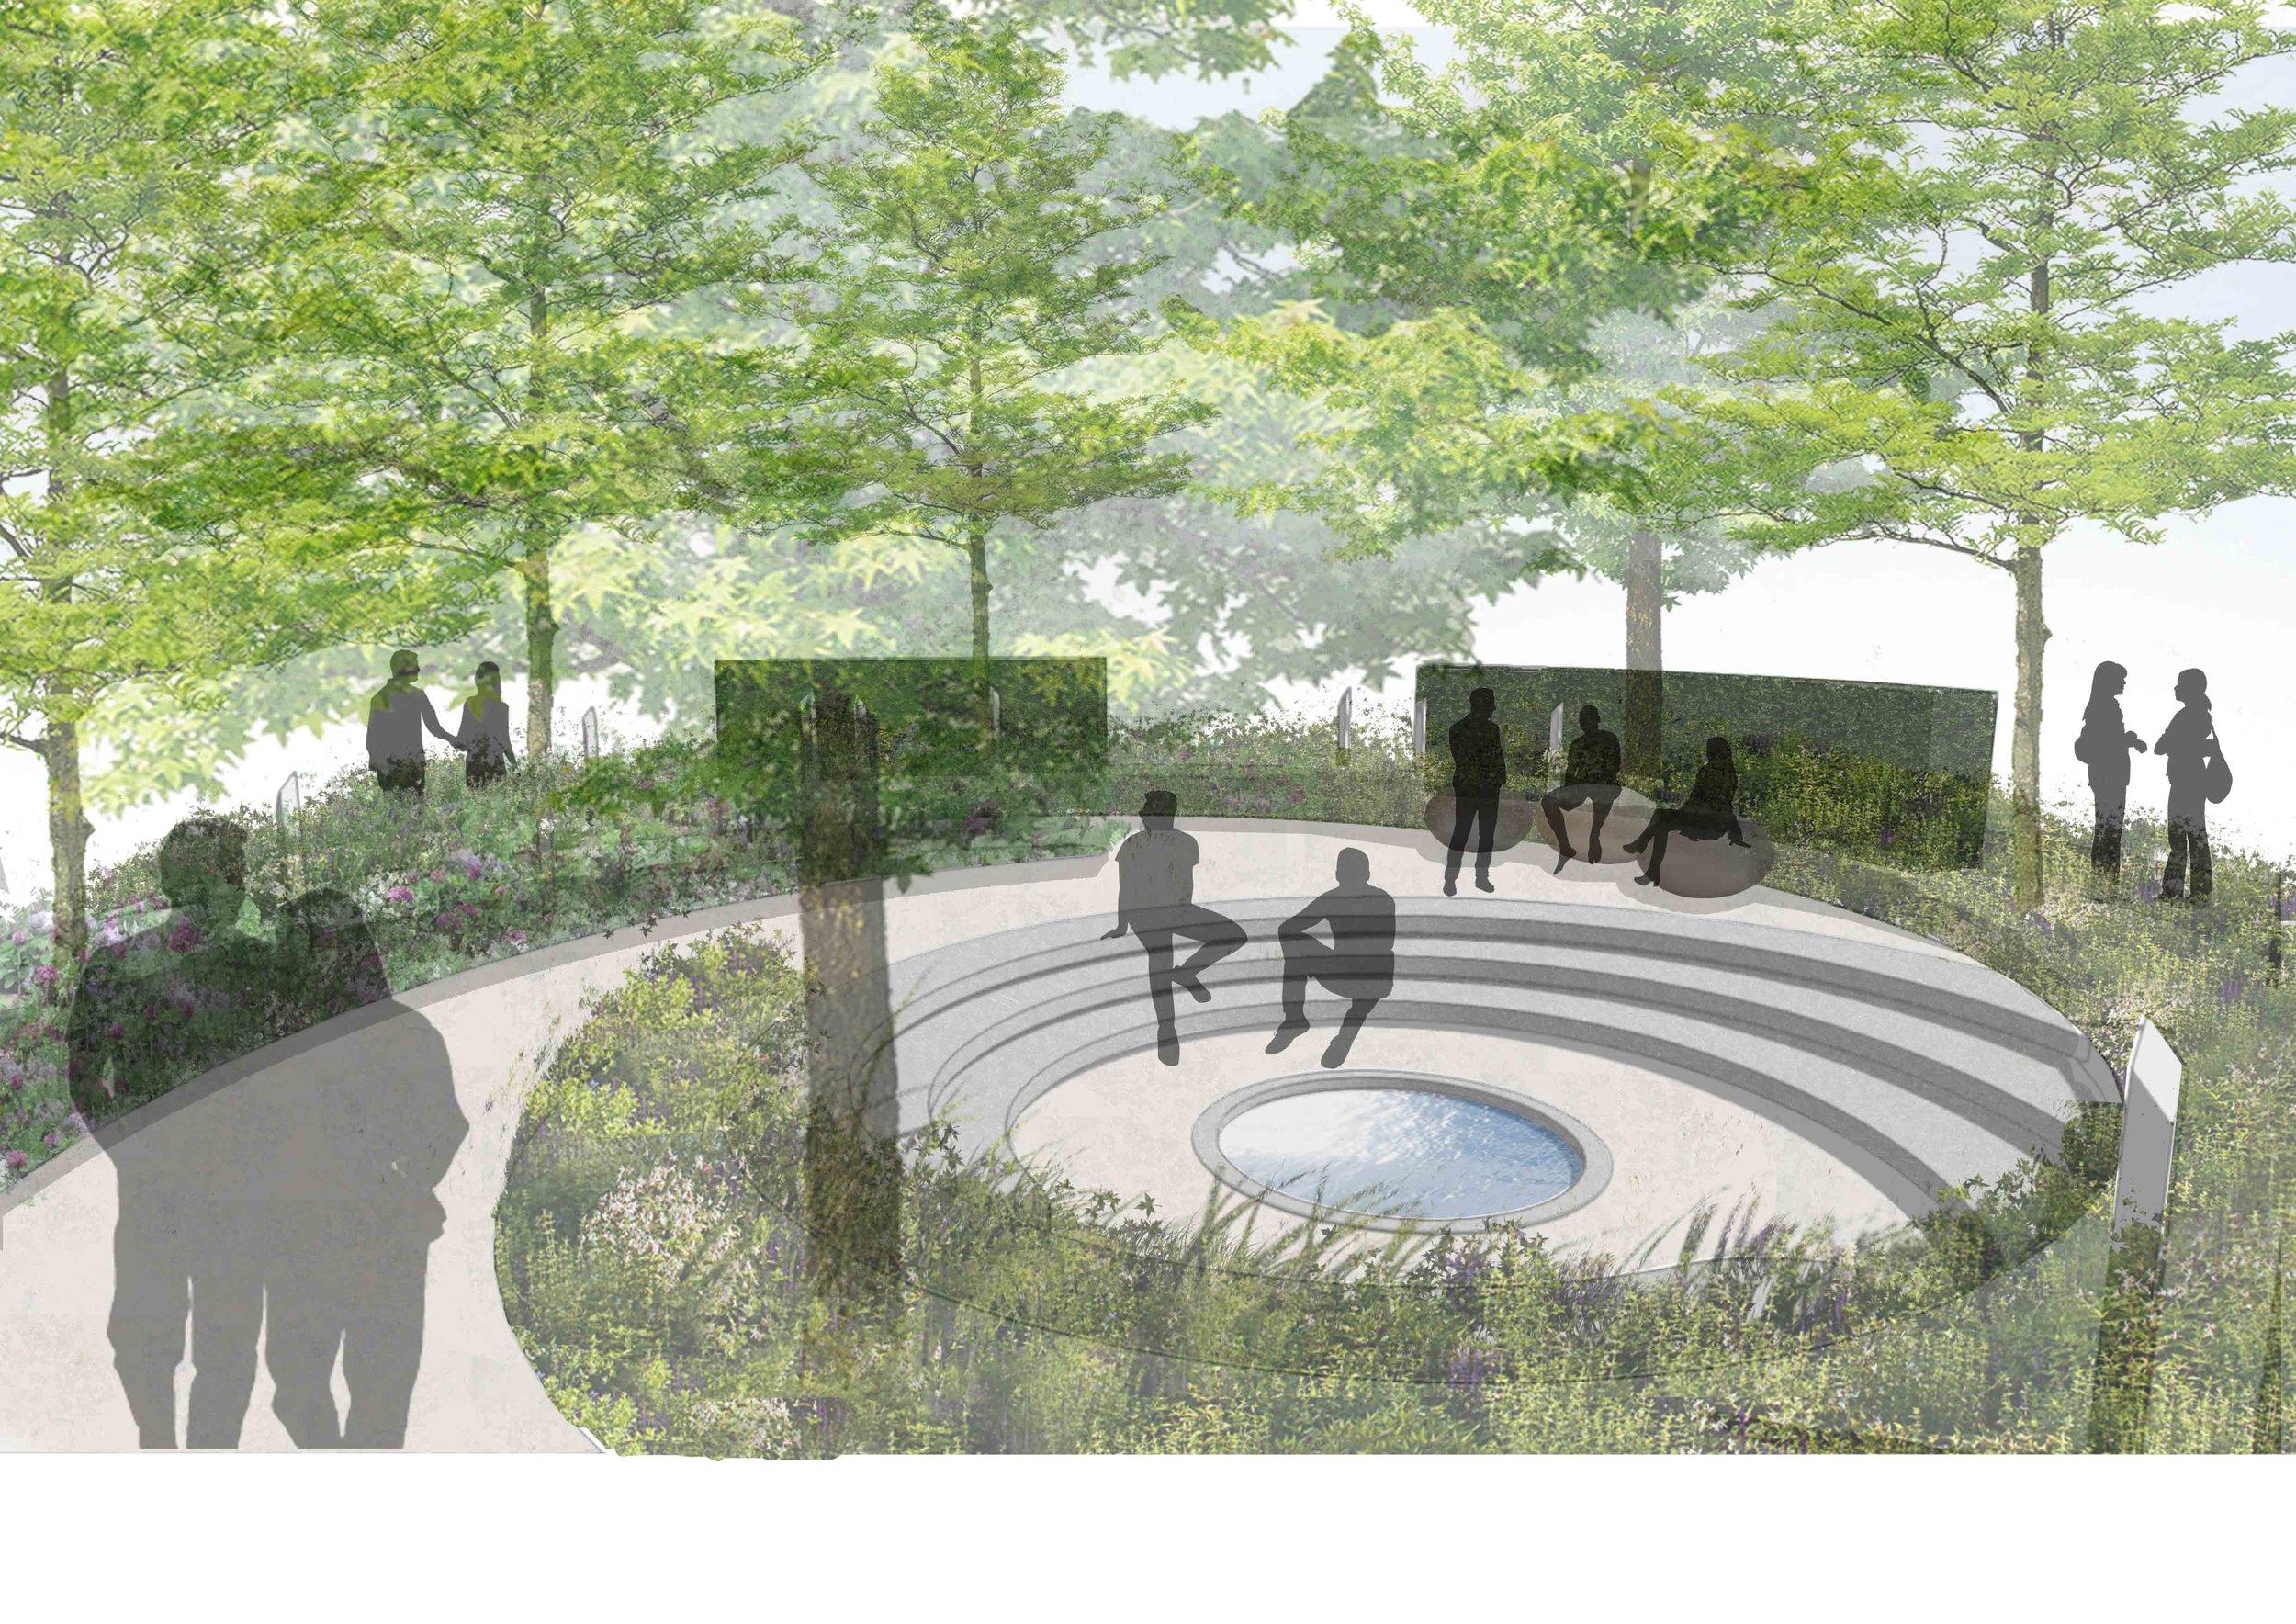 Tom Simpson design - Hampton court 2019 2.jpg